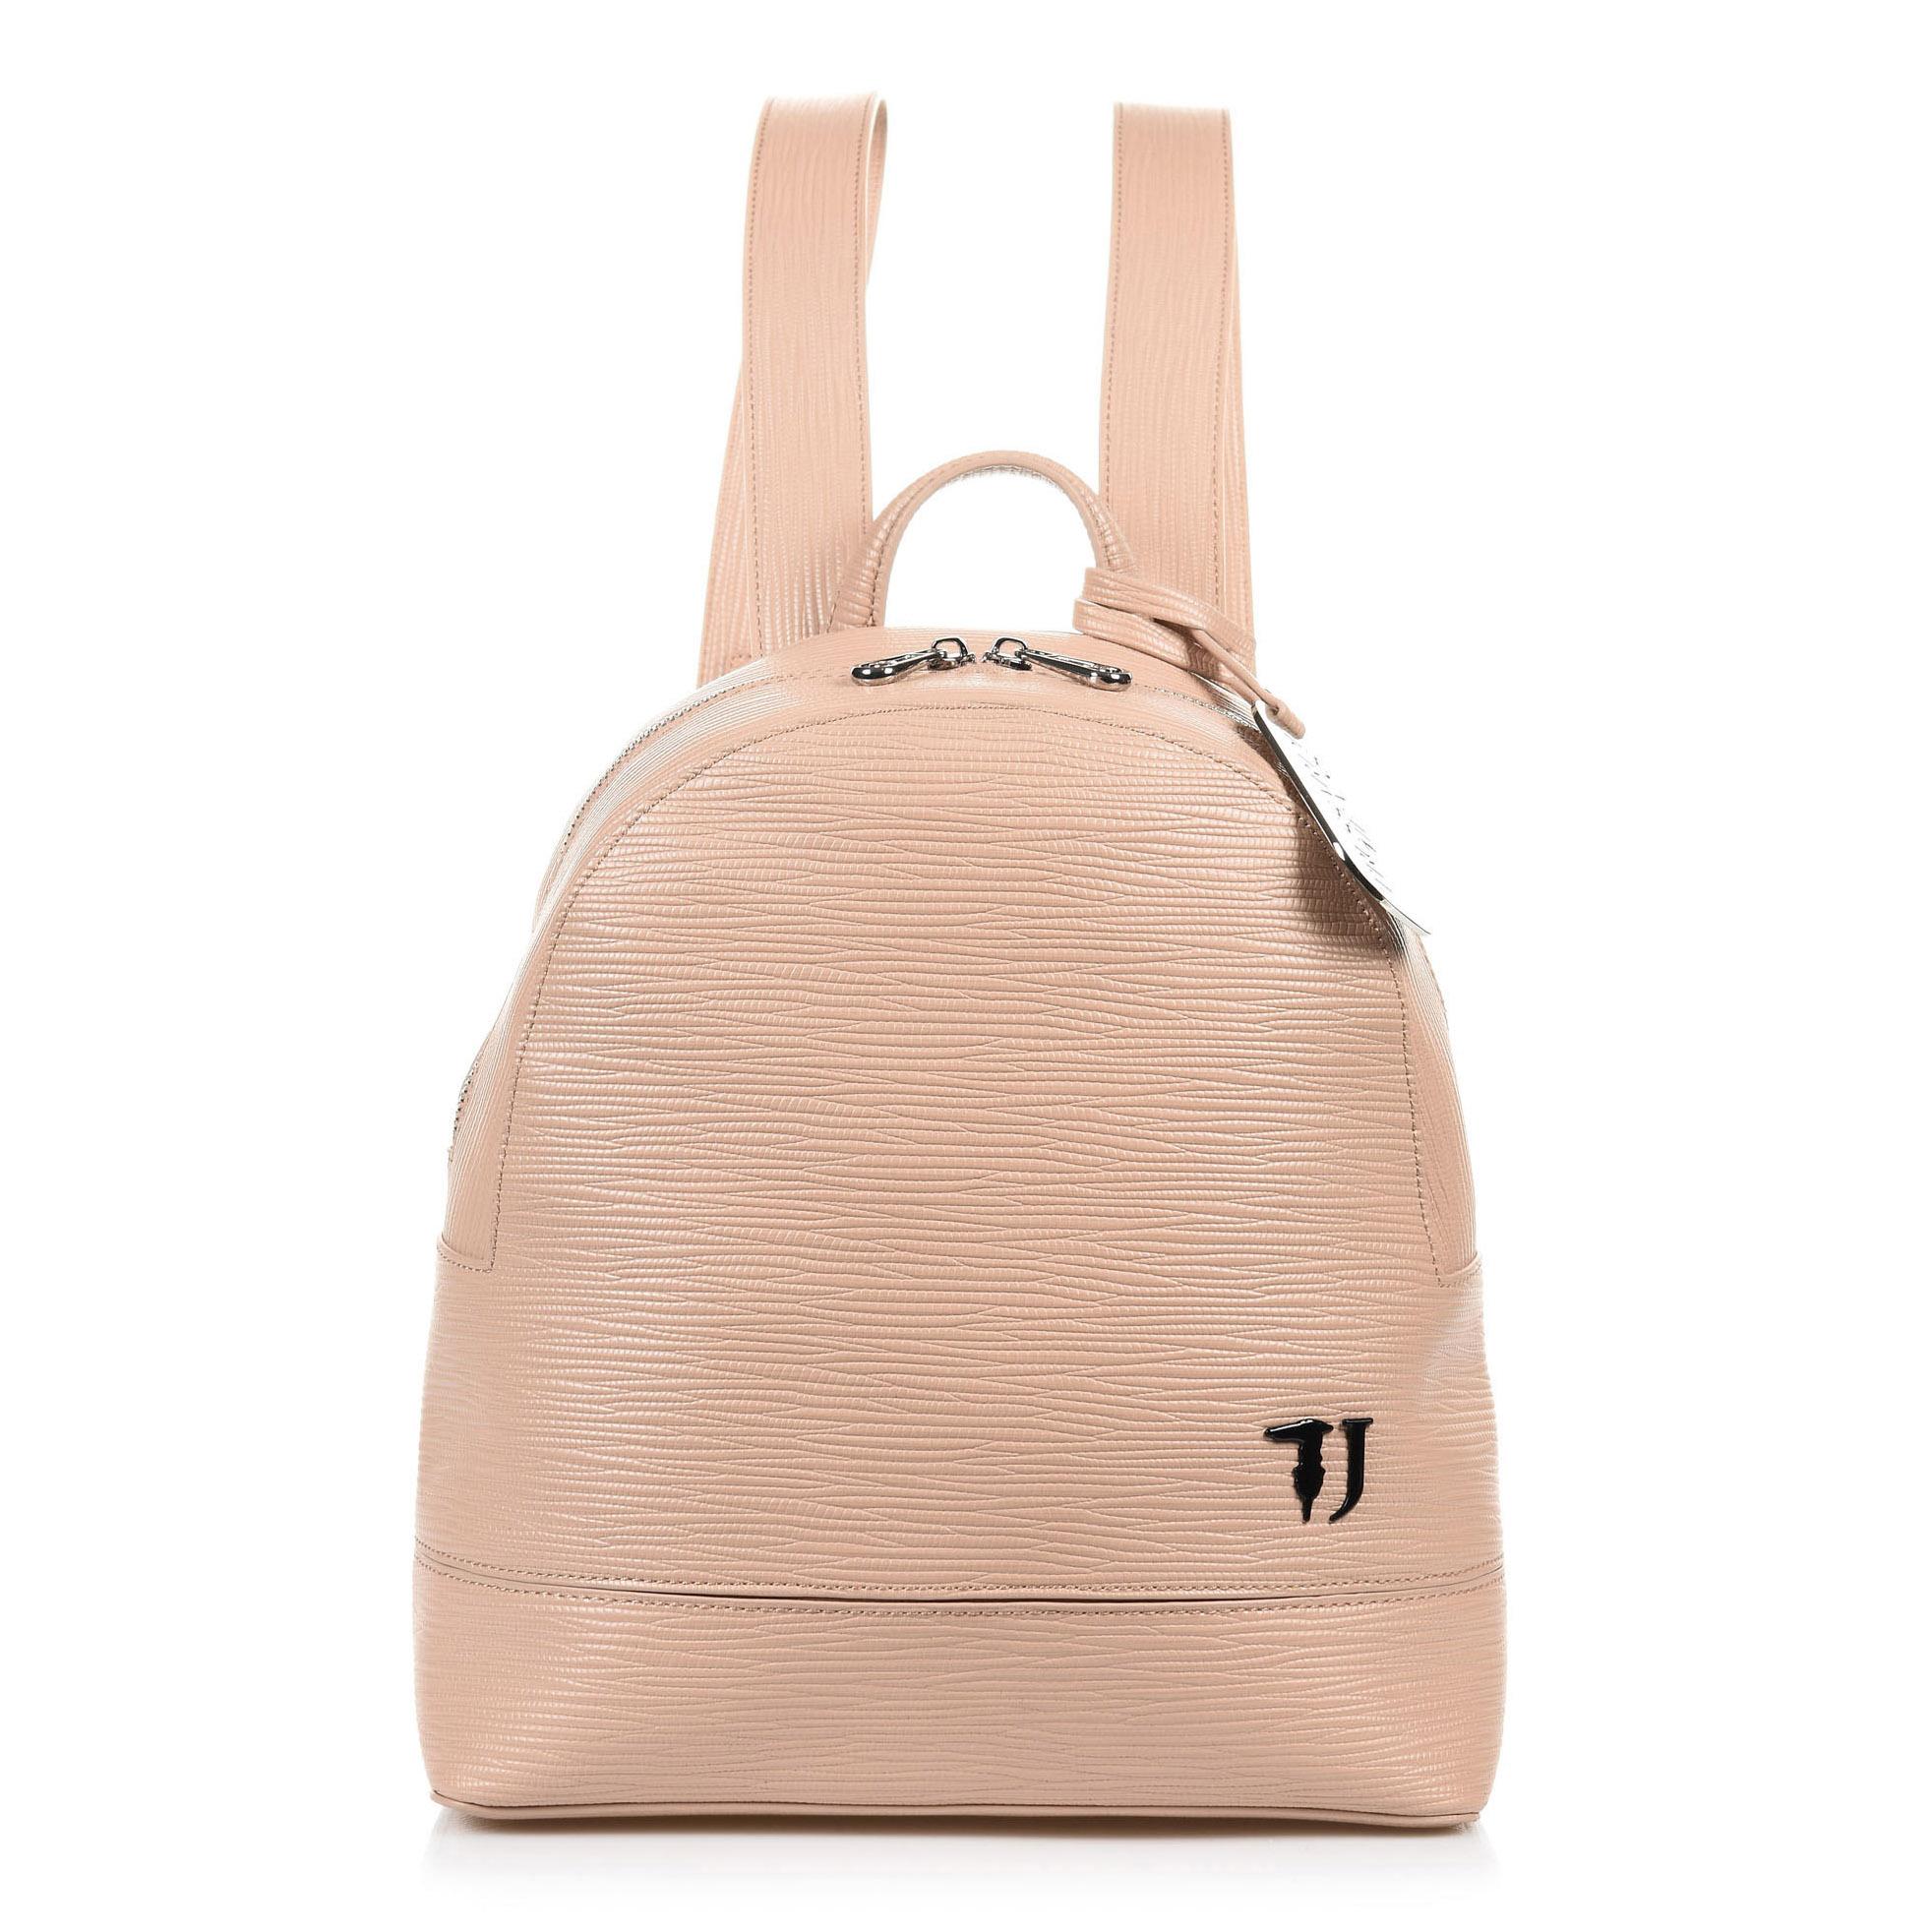 0eca6cdcb8 Σακίδιο Πλάτης Trussardi Jeans Τ-Easy City Backpack Md Saffiano Ecoleath  75B00665